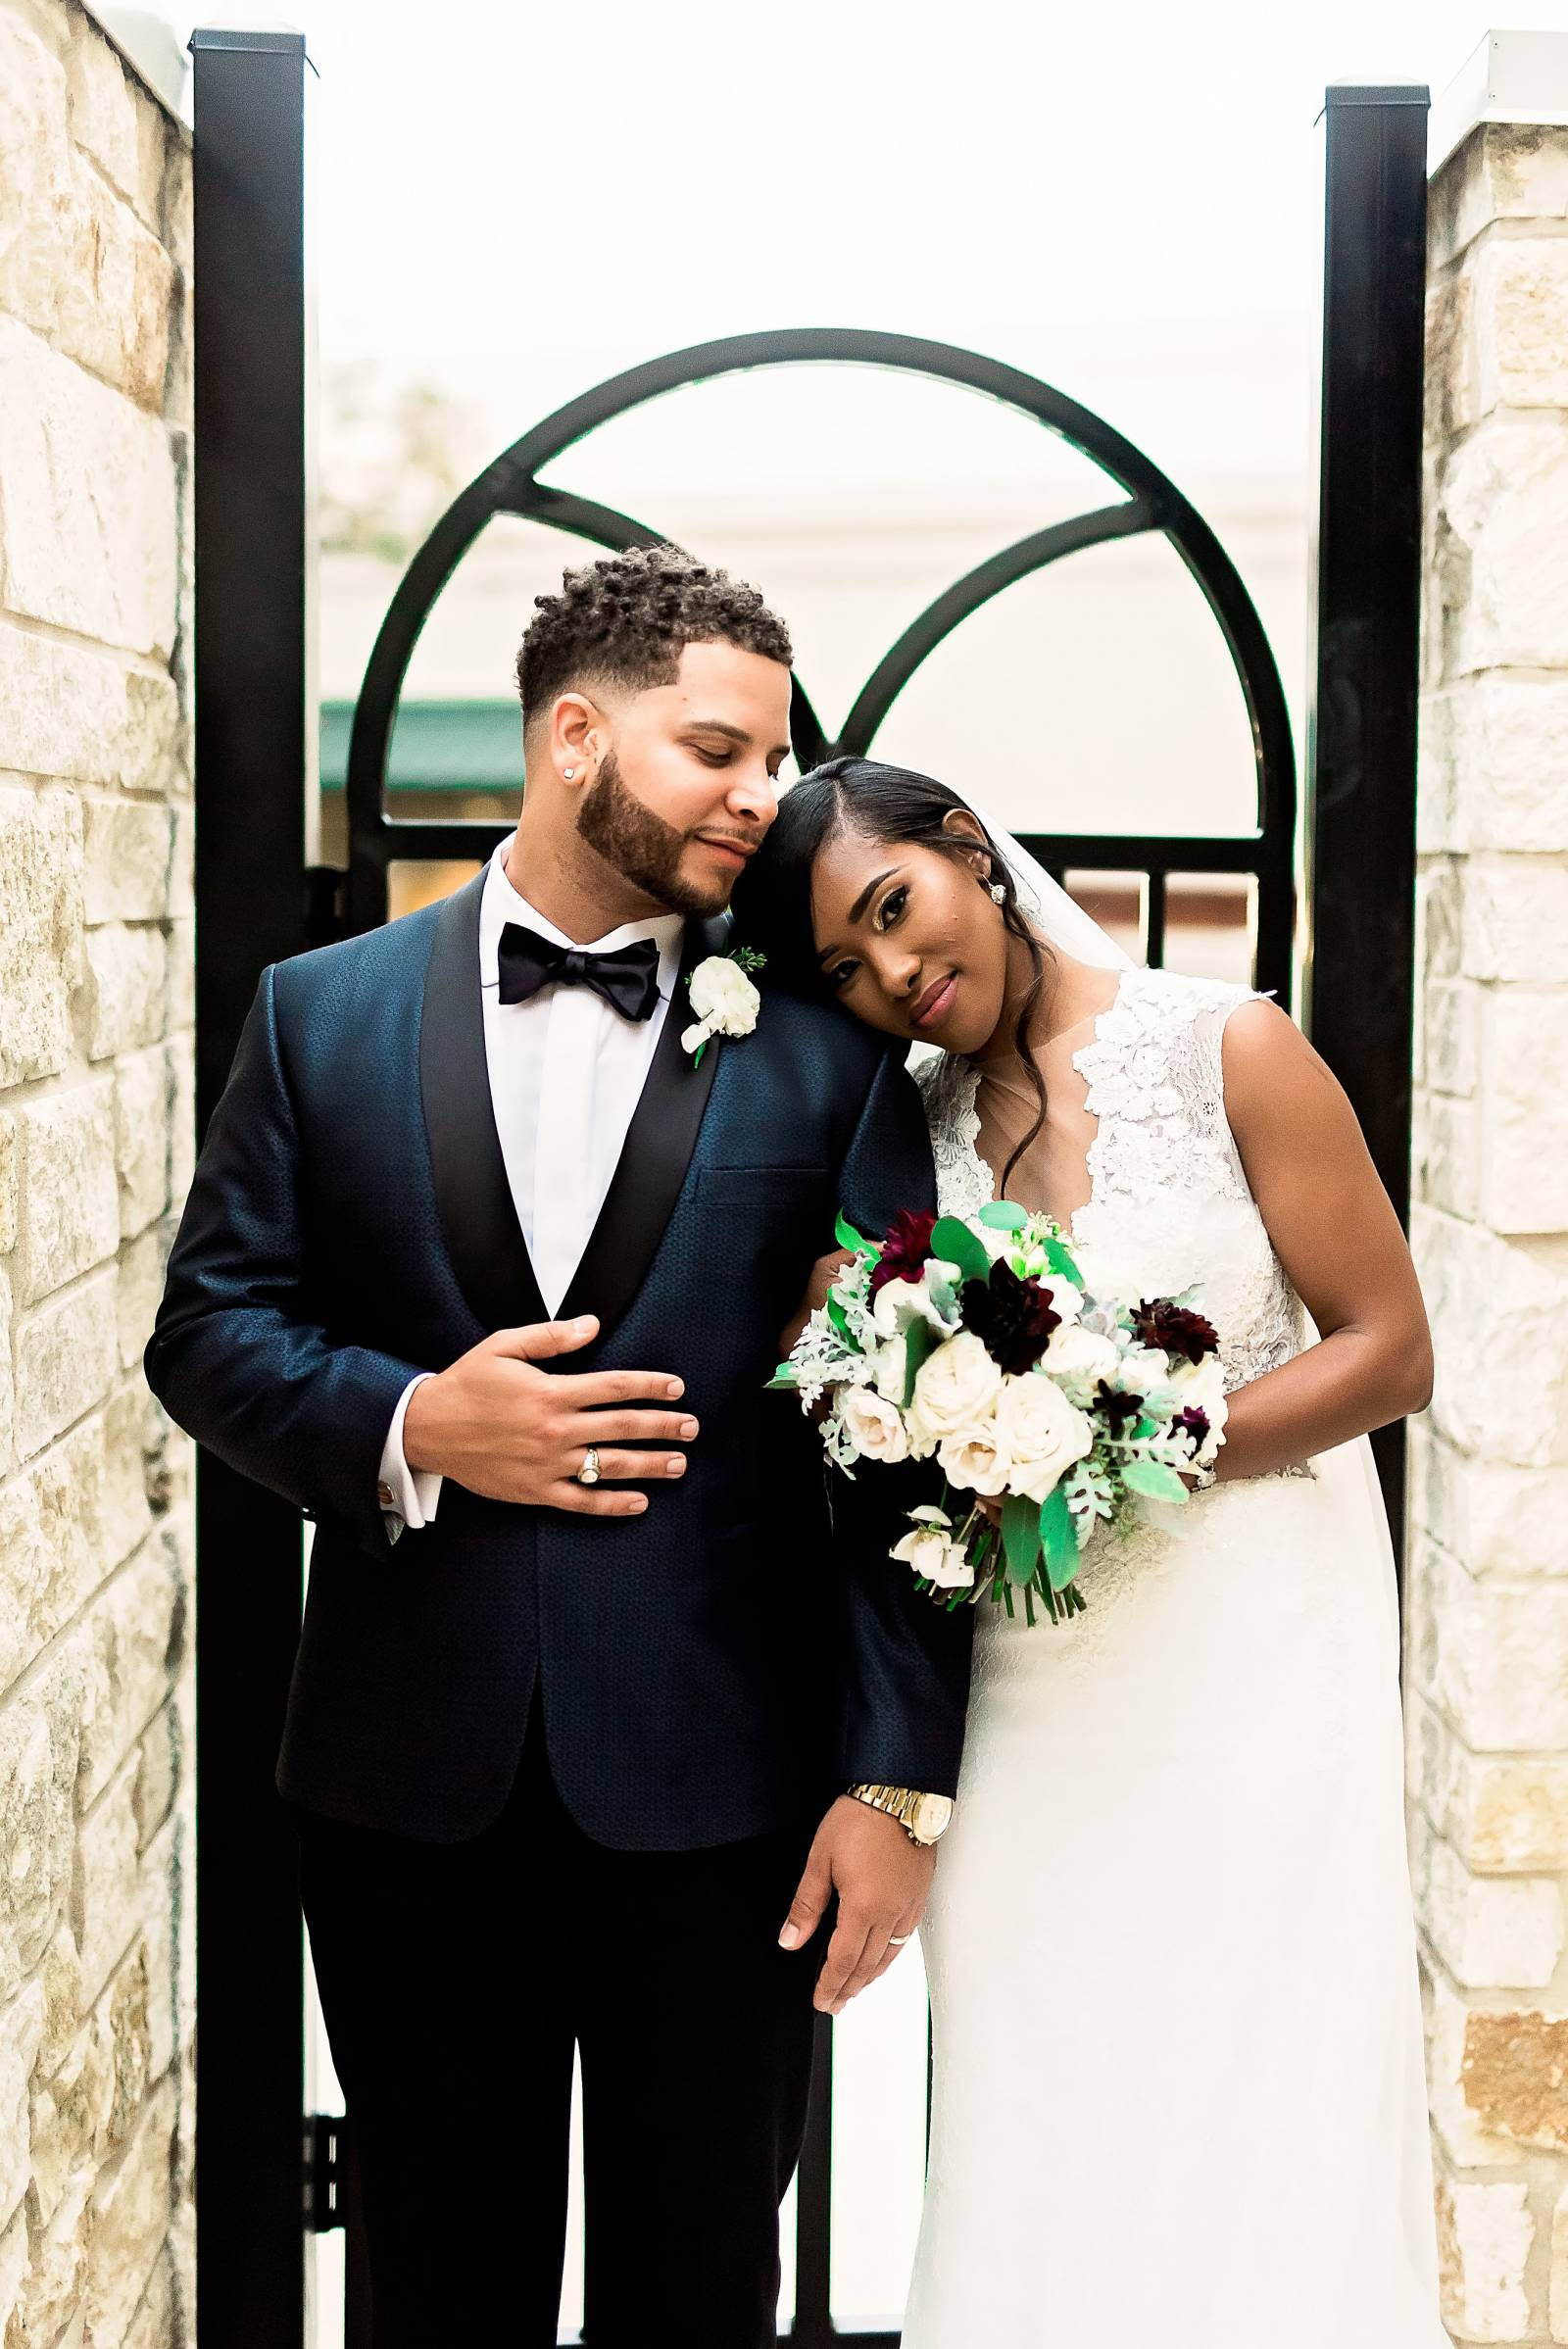 DeShana + Darryl Featured on the Black Bride - 2.0 - 6.jpg